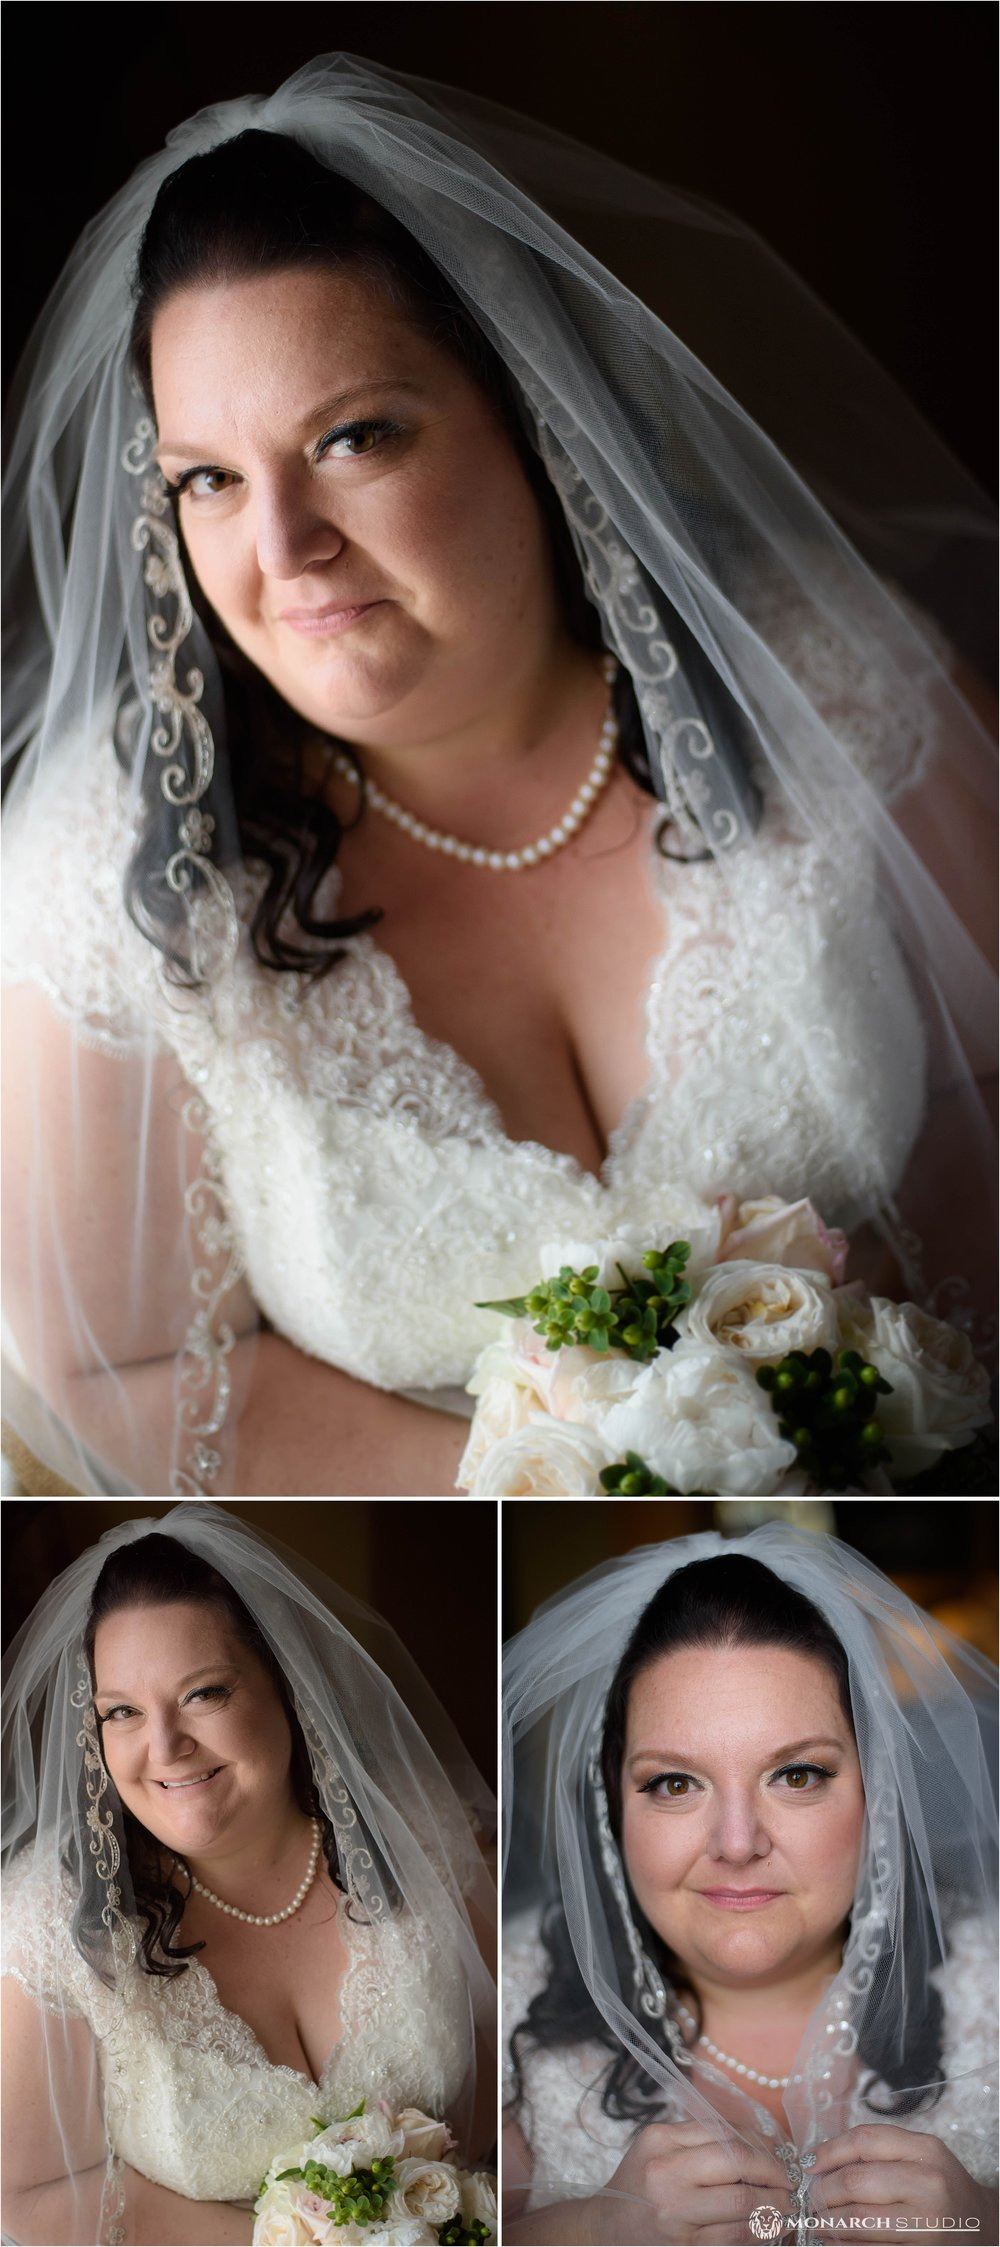 st-augustine-photographer-intimate-wedding-010.jpg